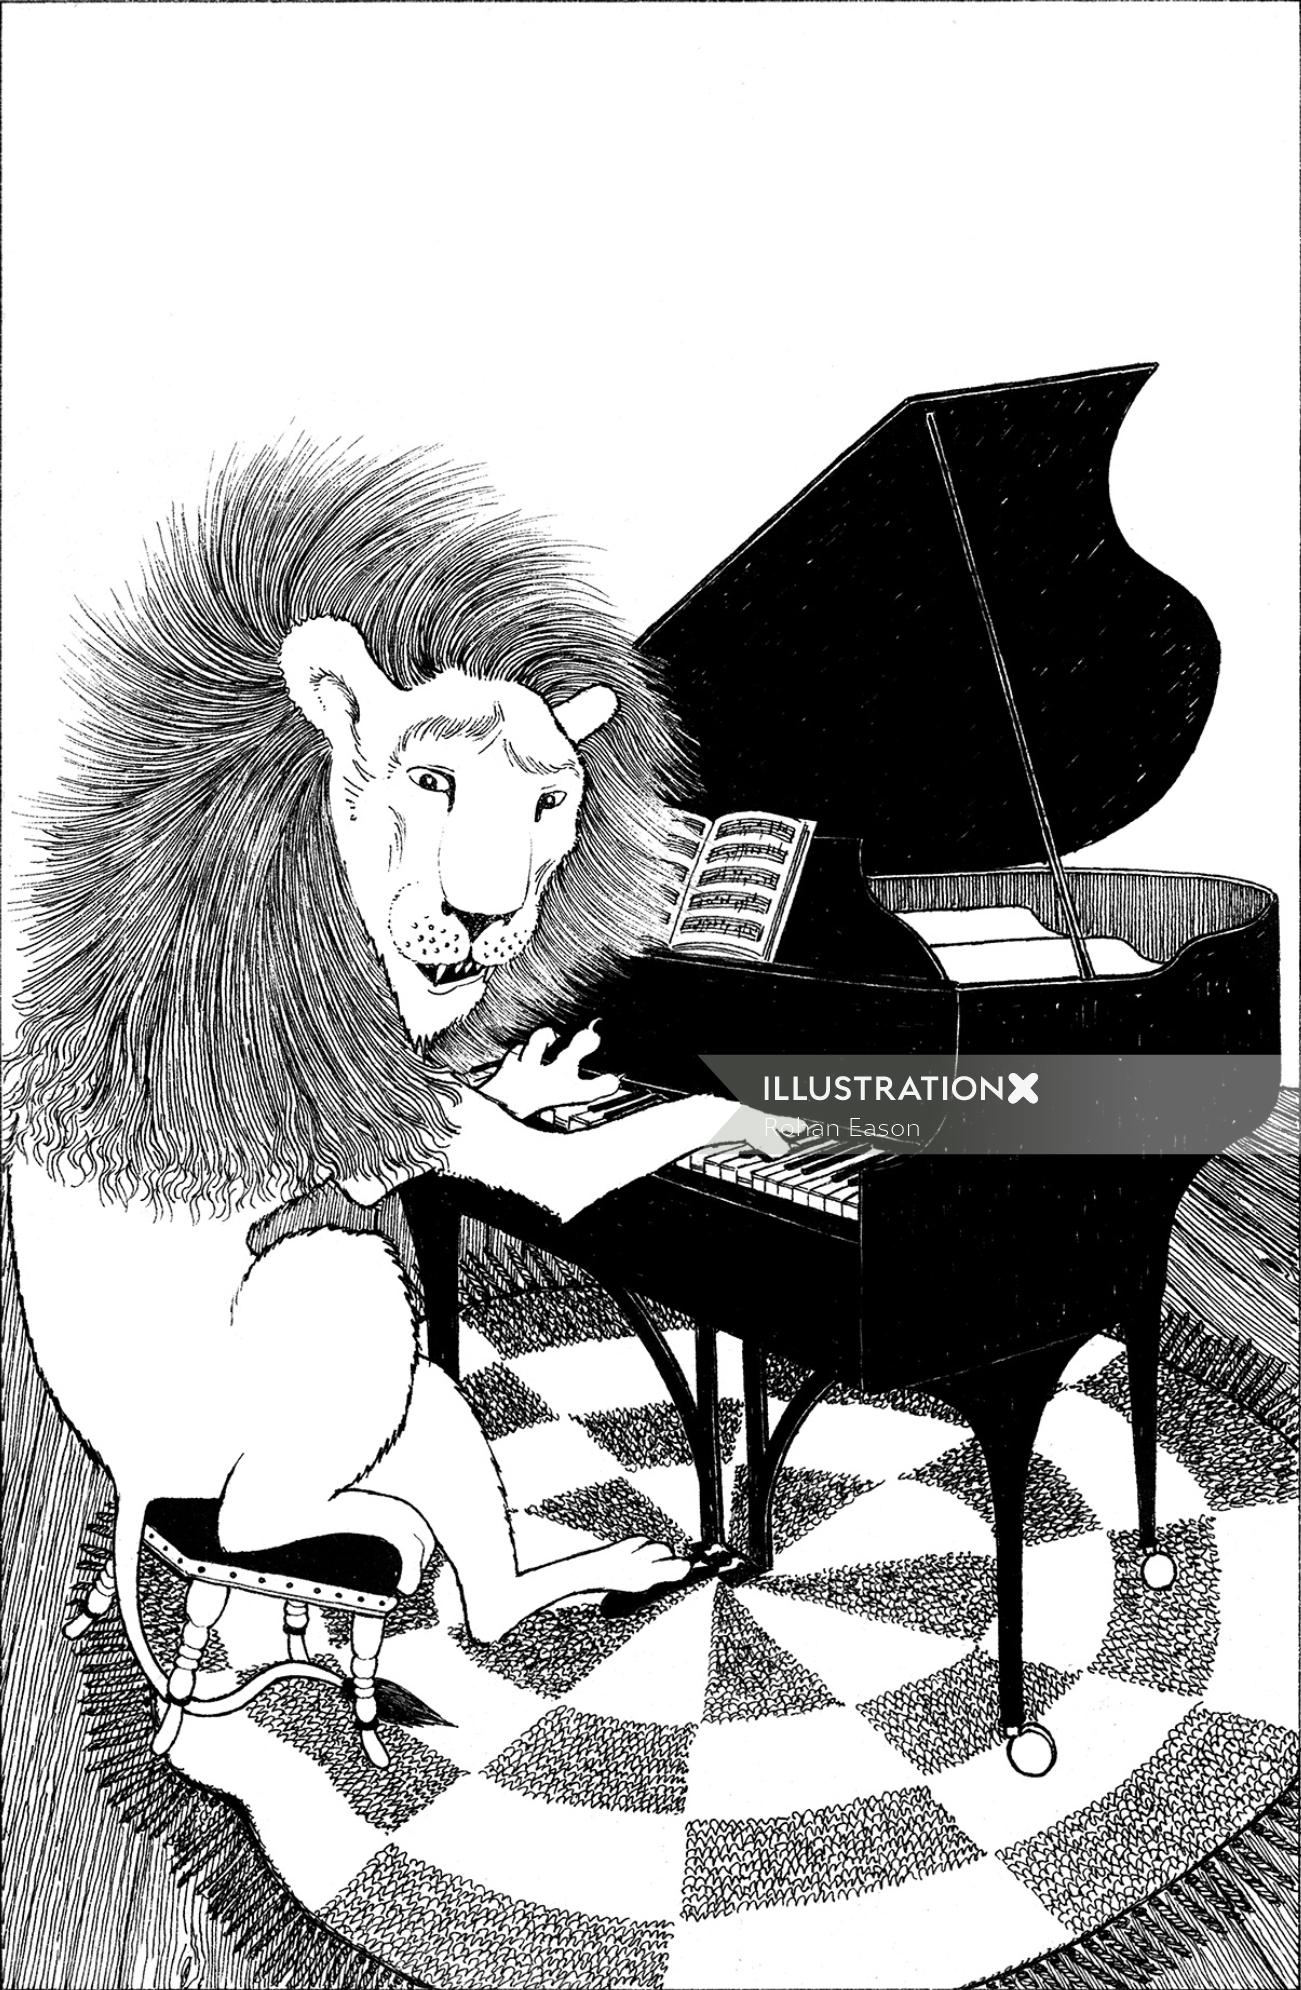 Pencil Sketch of Lion Plays Piano